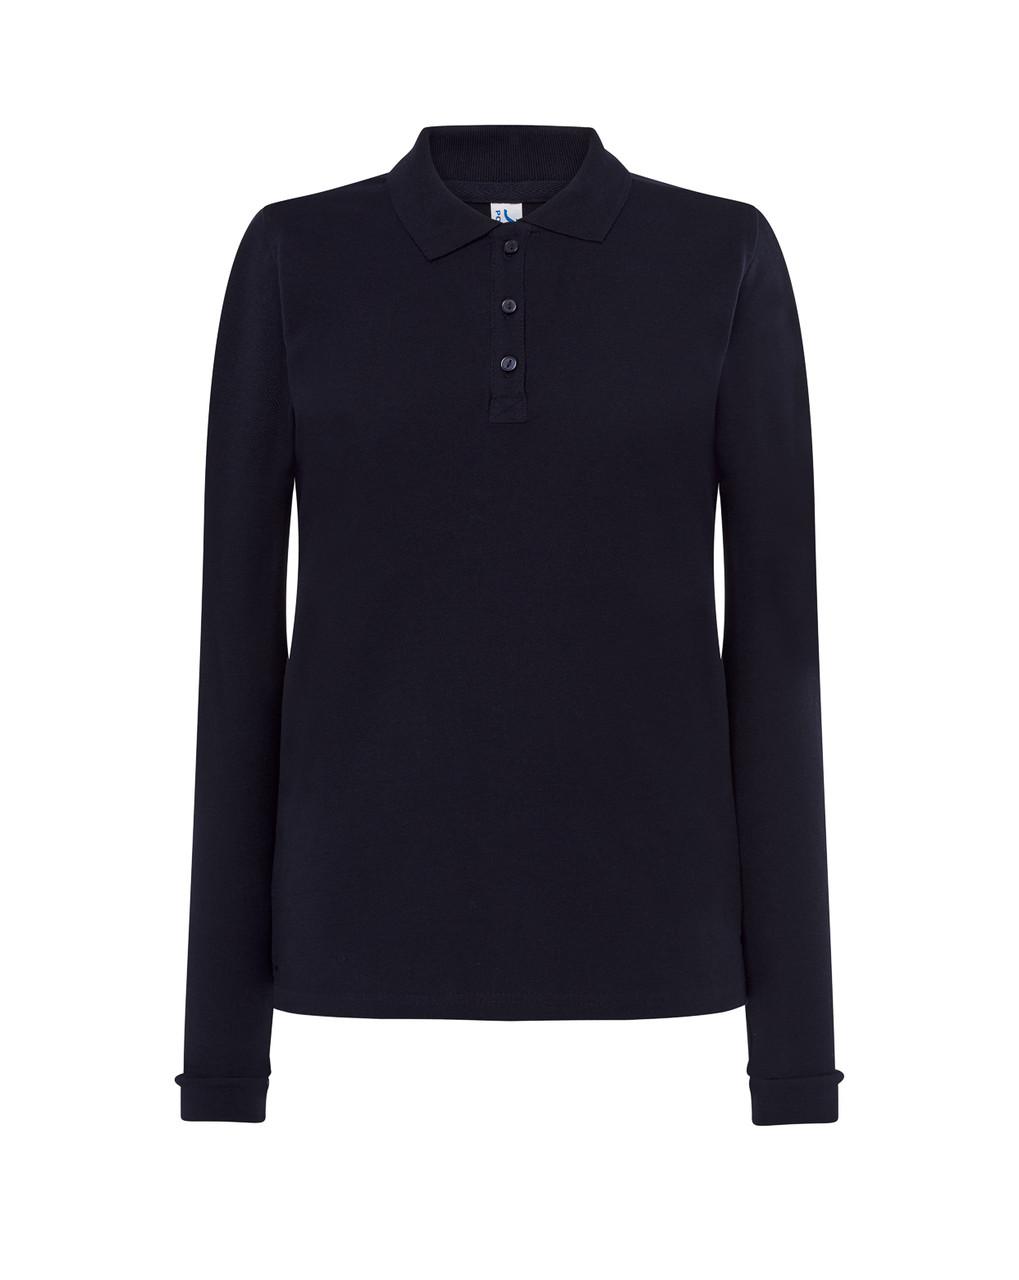 Женская футболка-поло JHK POLO REGULAR LADY LS цвет темно-синий (NY)